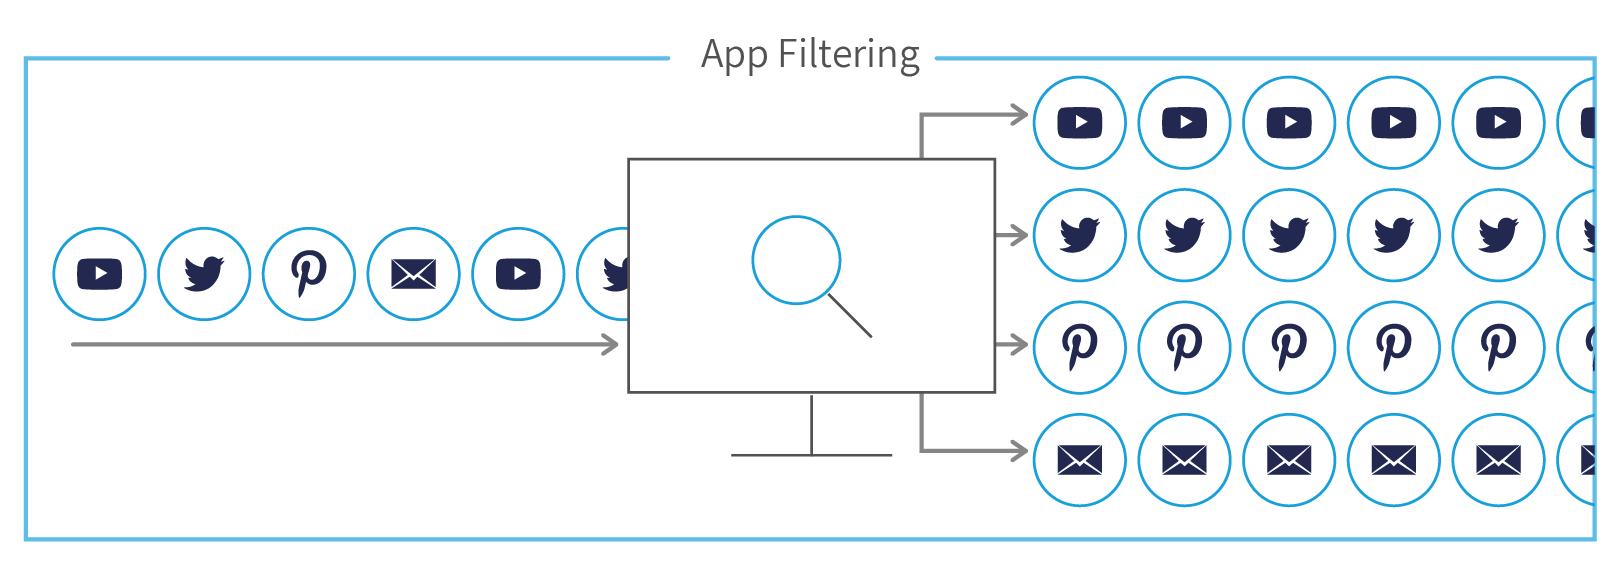 new diagrams_App filtering-